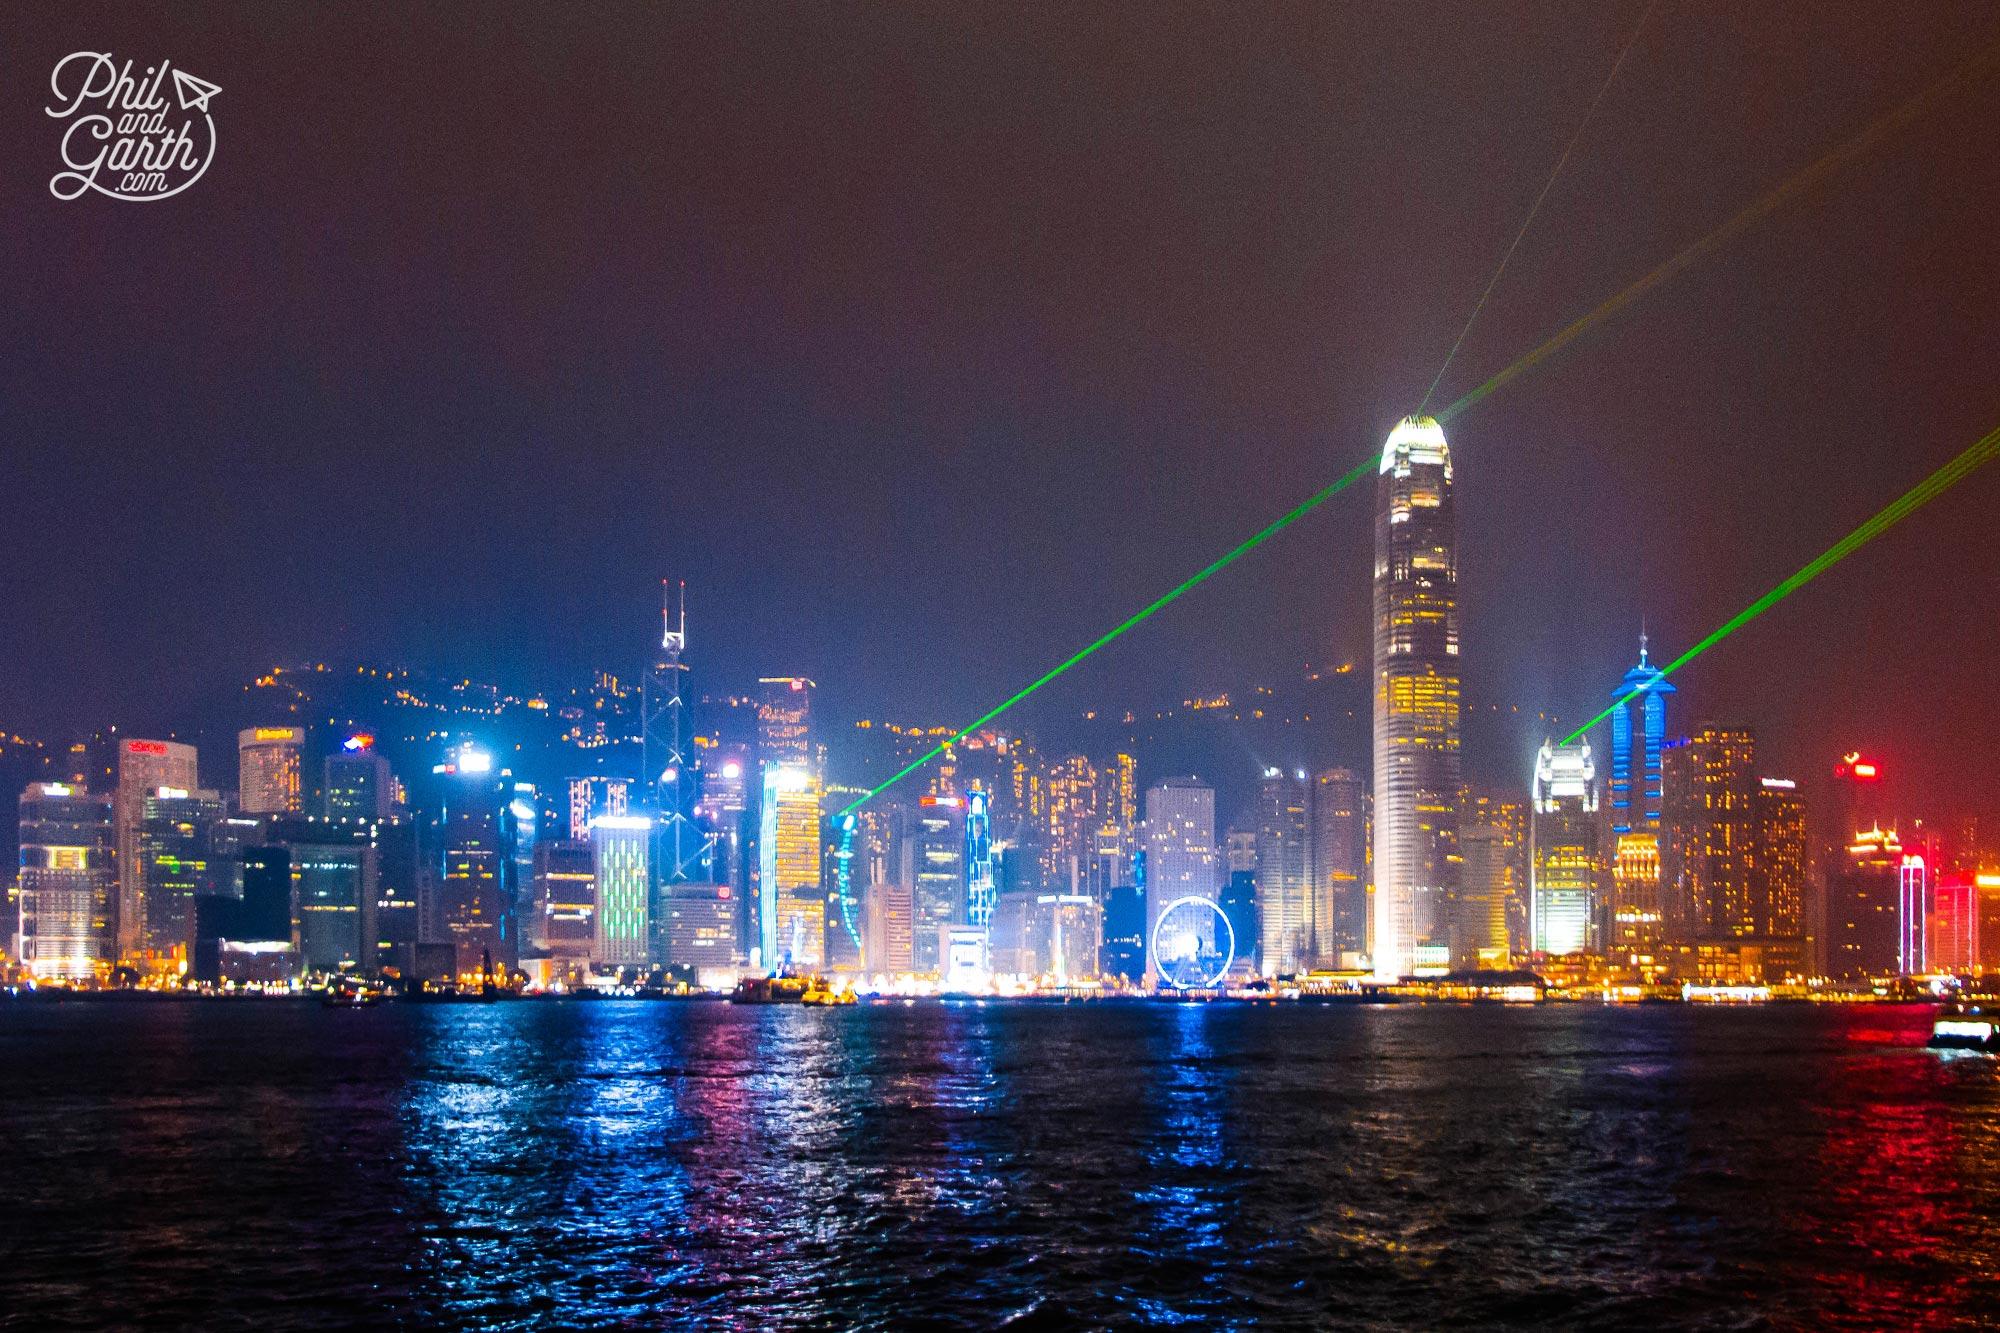 The Symphony of Lights show as viewed from Tsim Sha Tsui promenade